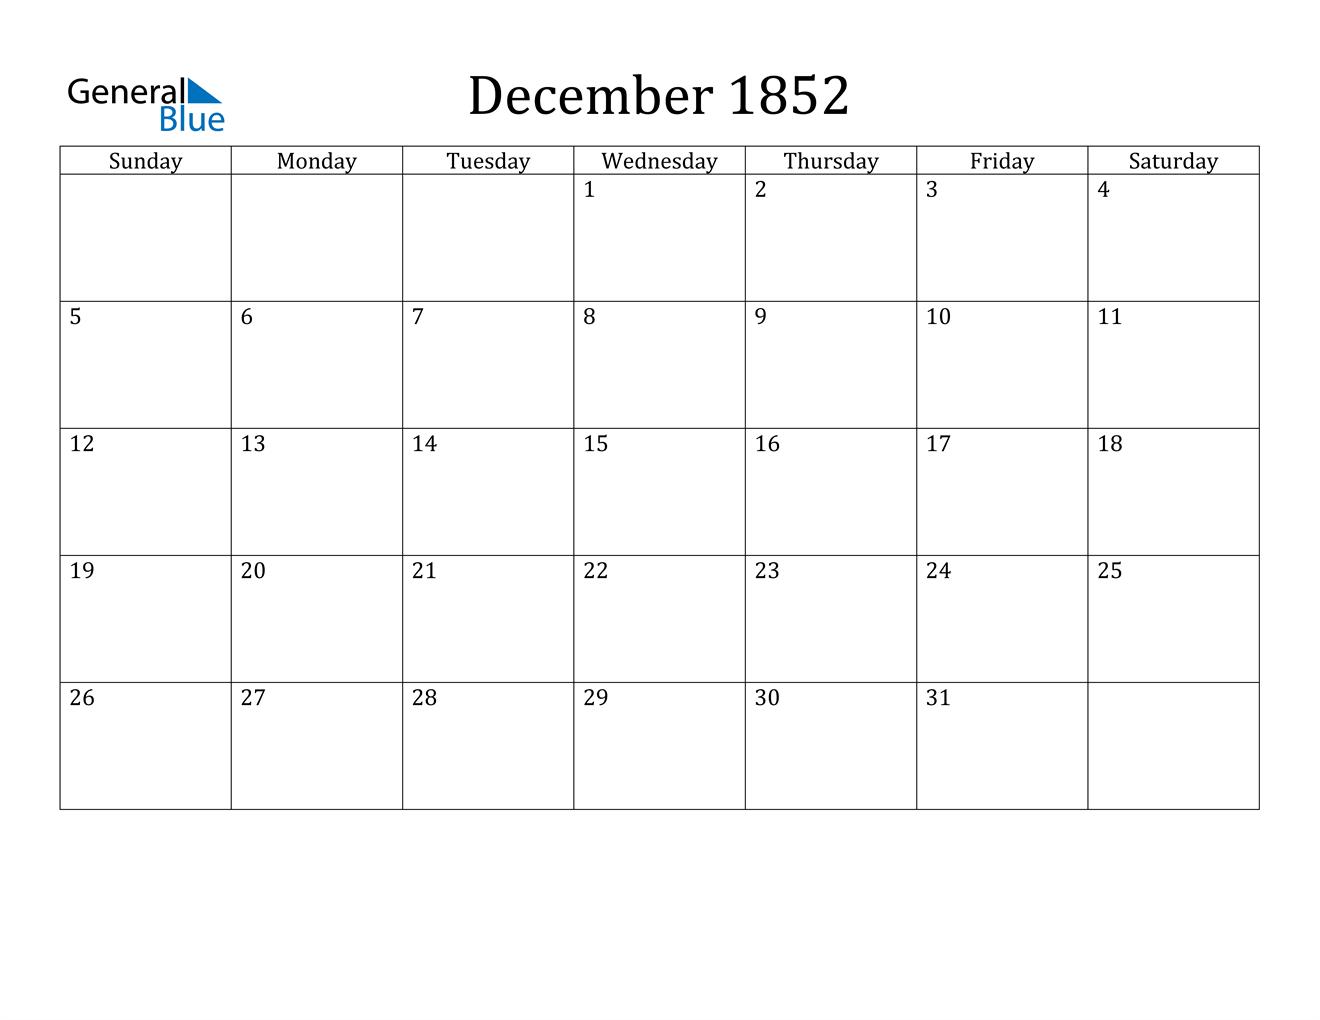 Image of December 1852 Calendar